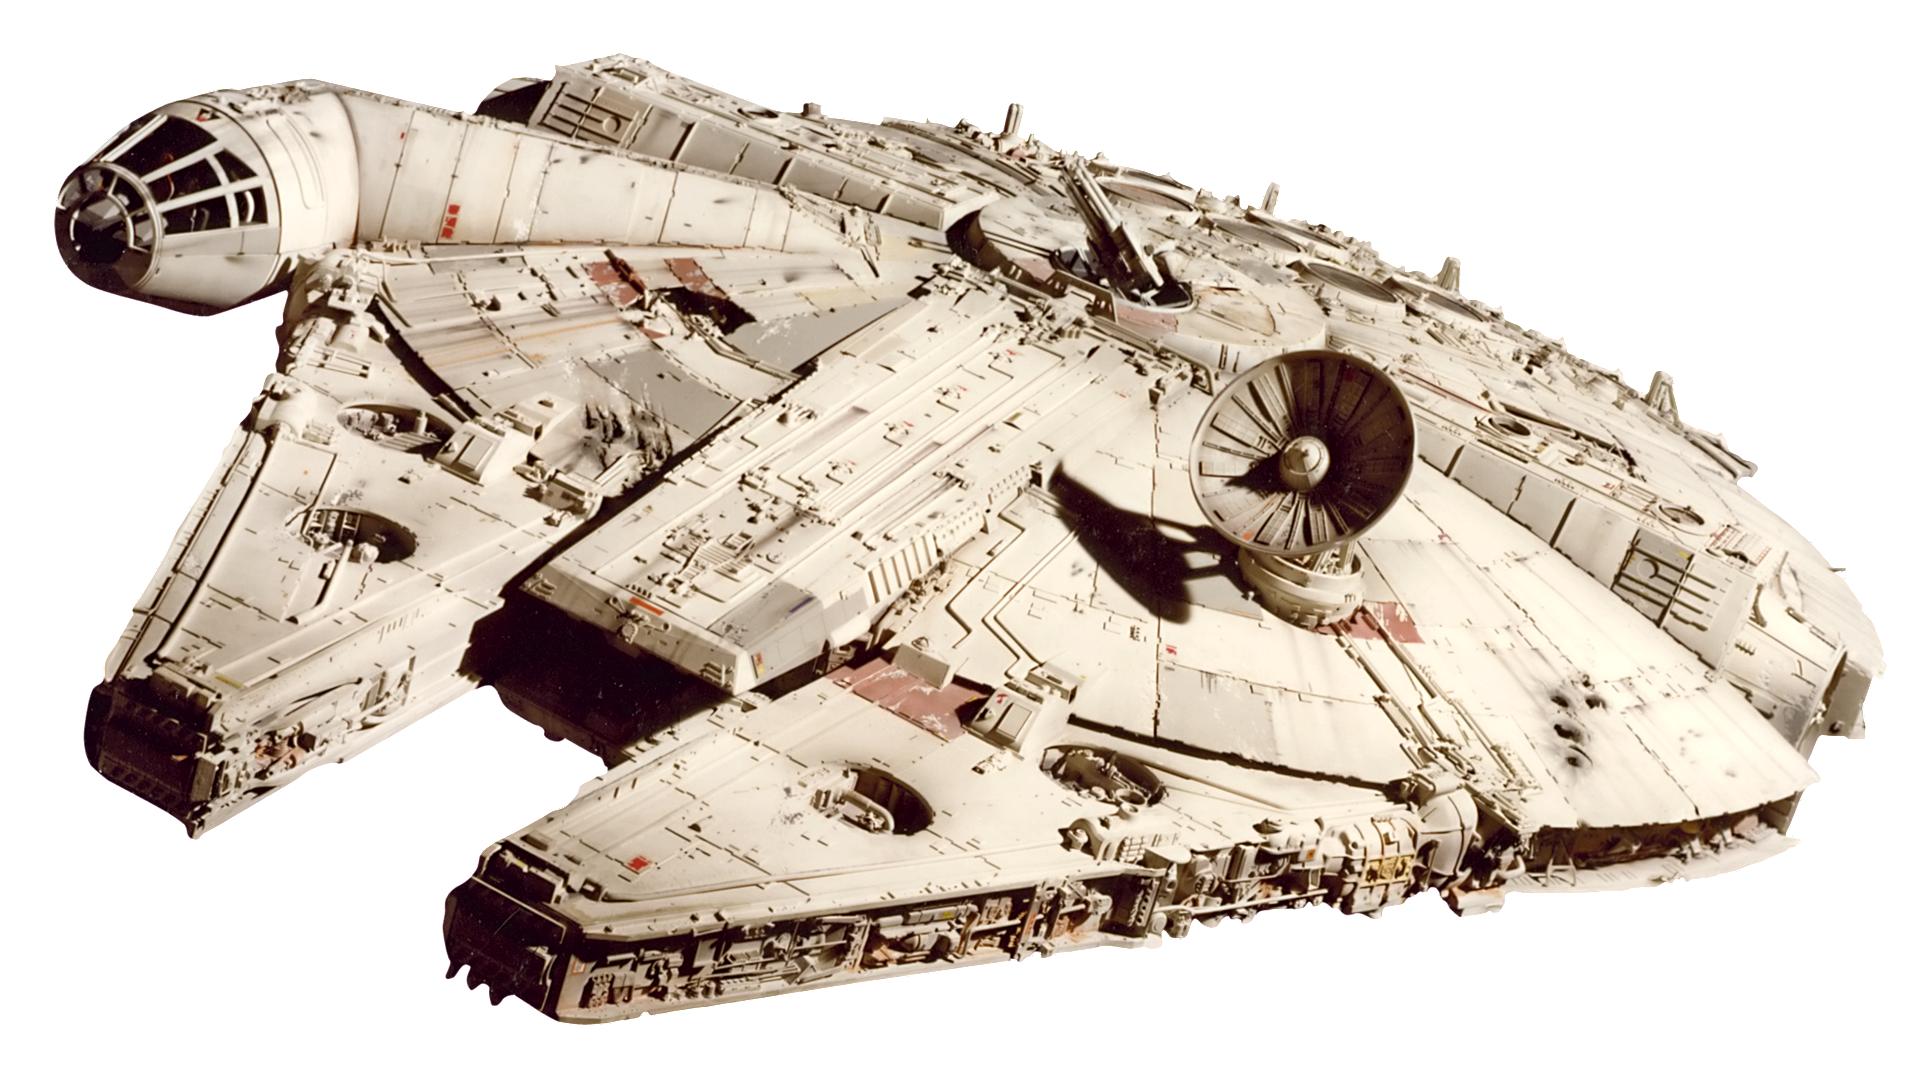 Millenniumfalcon Fathead Png 1920 1080 Star Wars Design Star Wars Vehicles Star Wars 1977